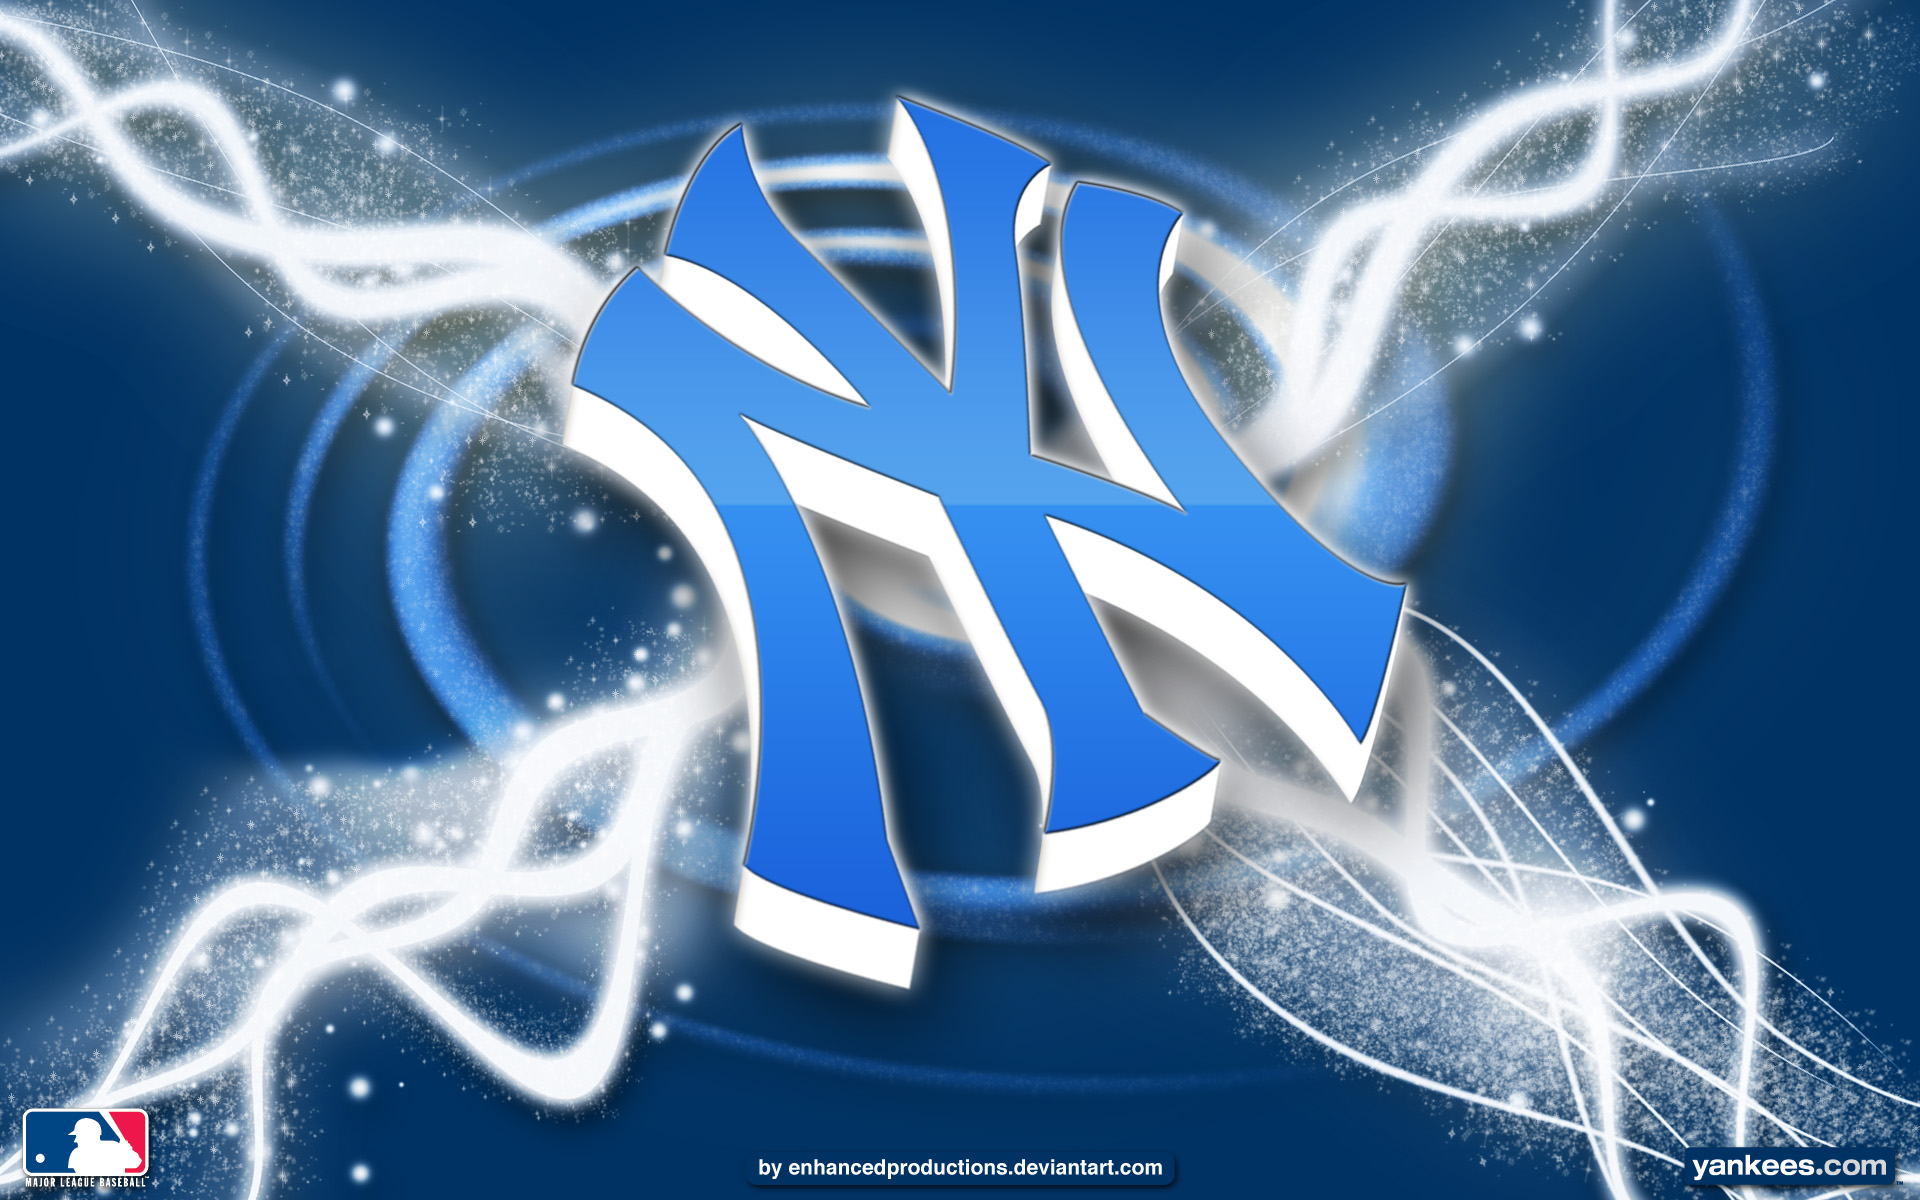 New York Yankees wallpapers New York Yankees background 1920x1200